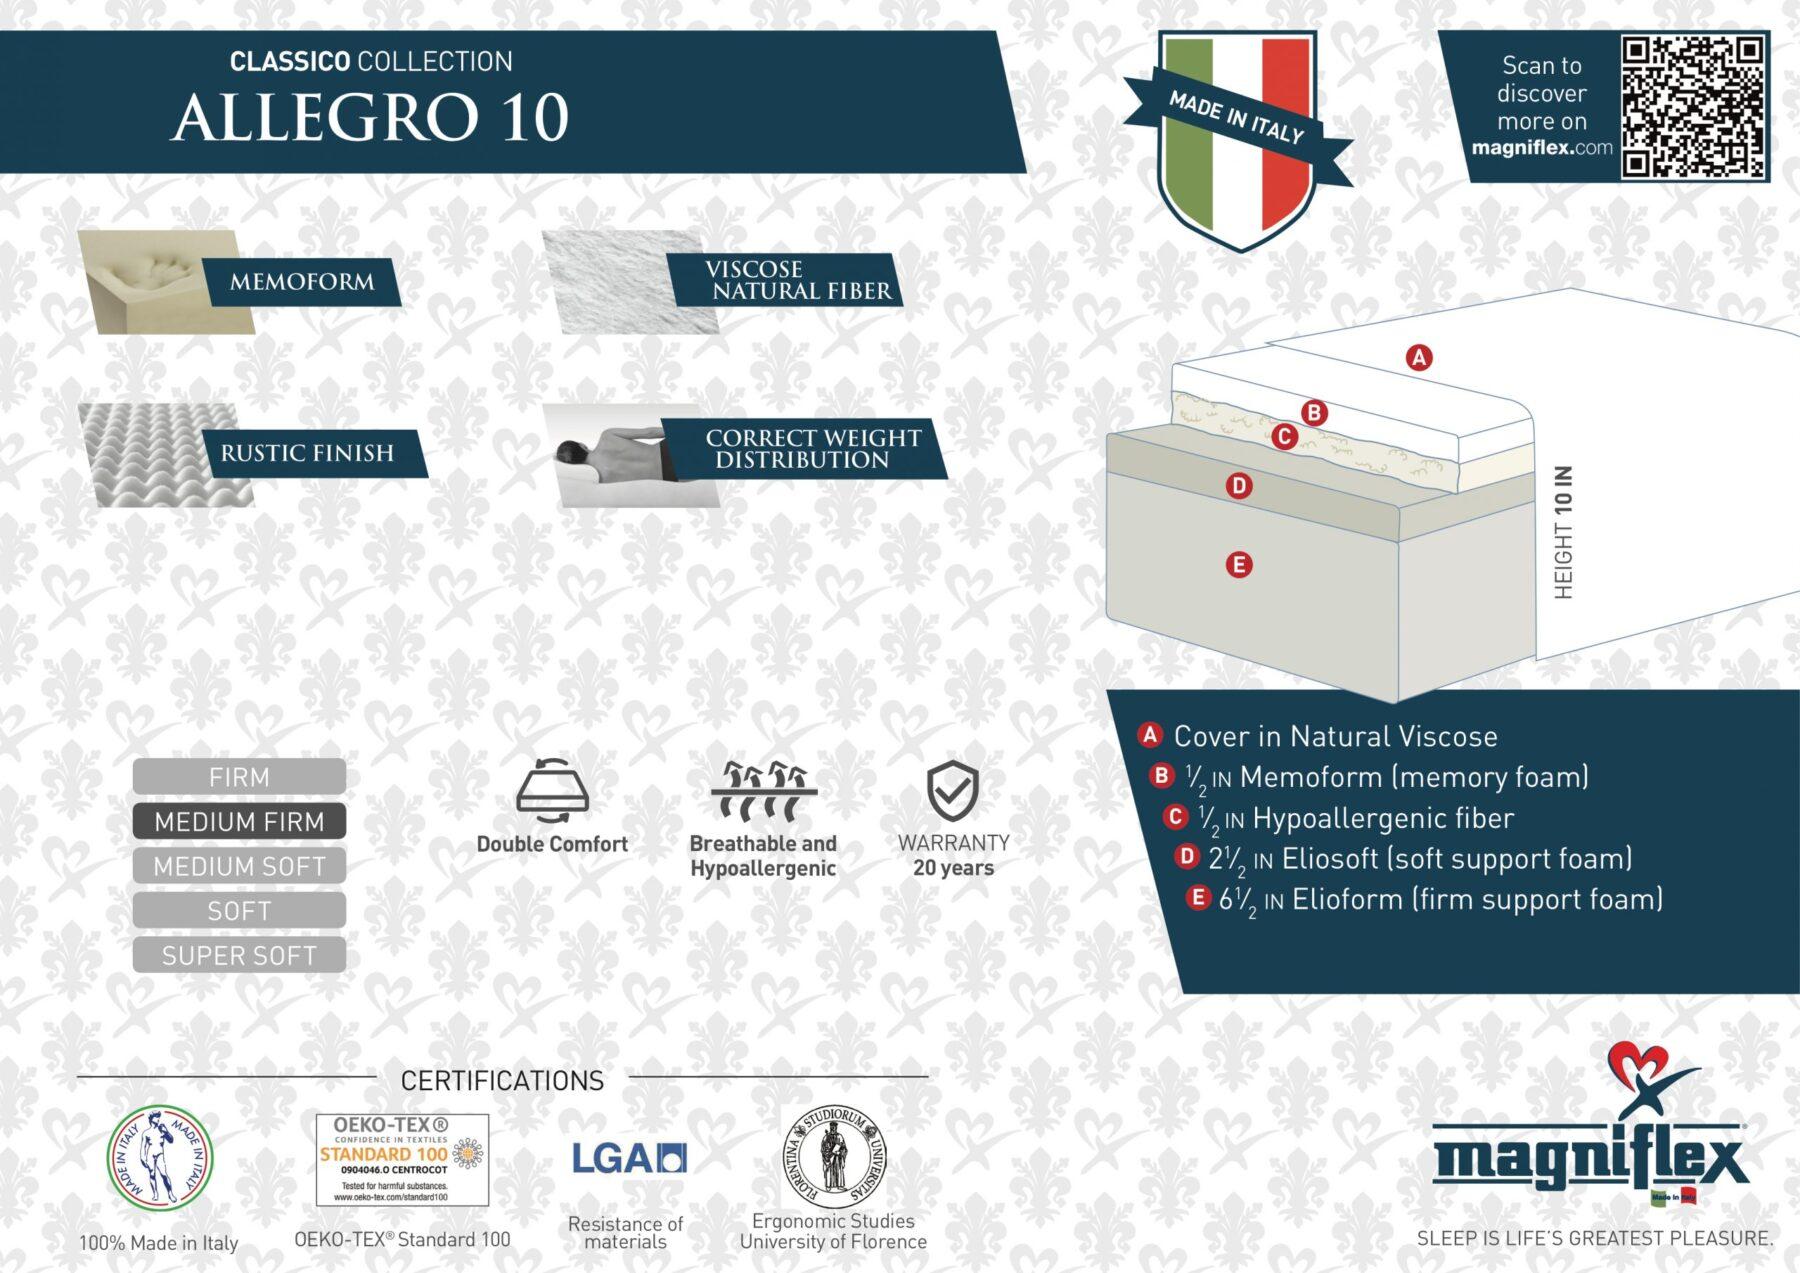 Allegro 10 Insert